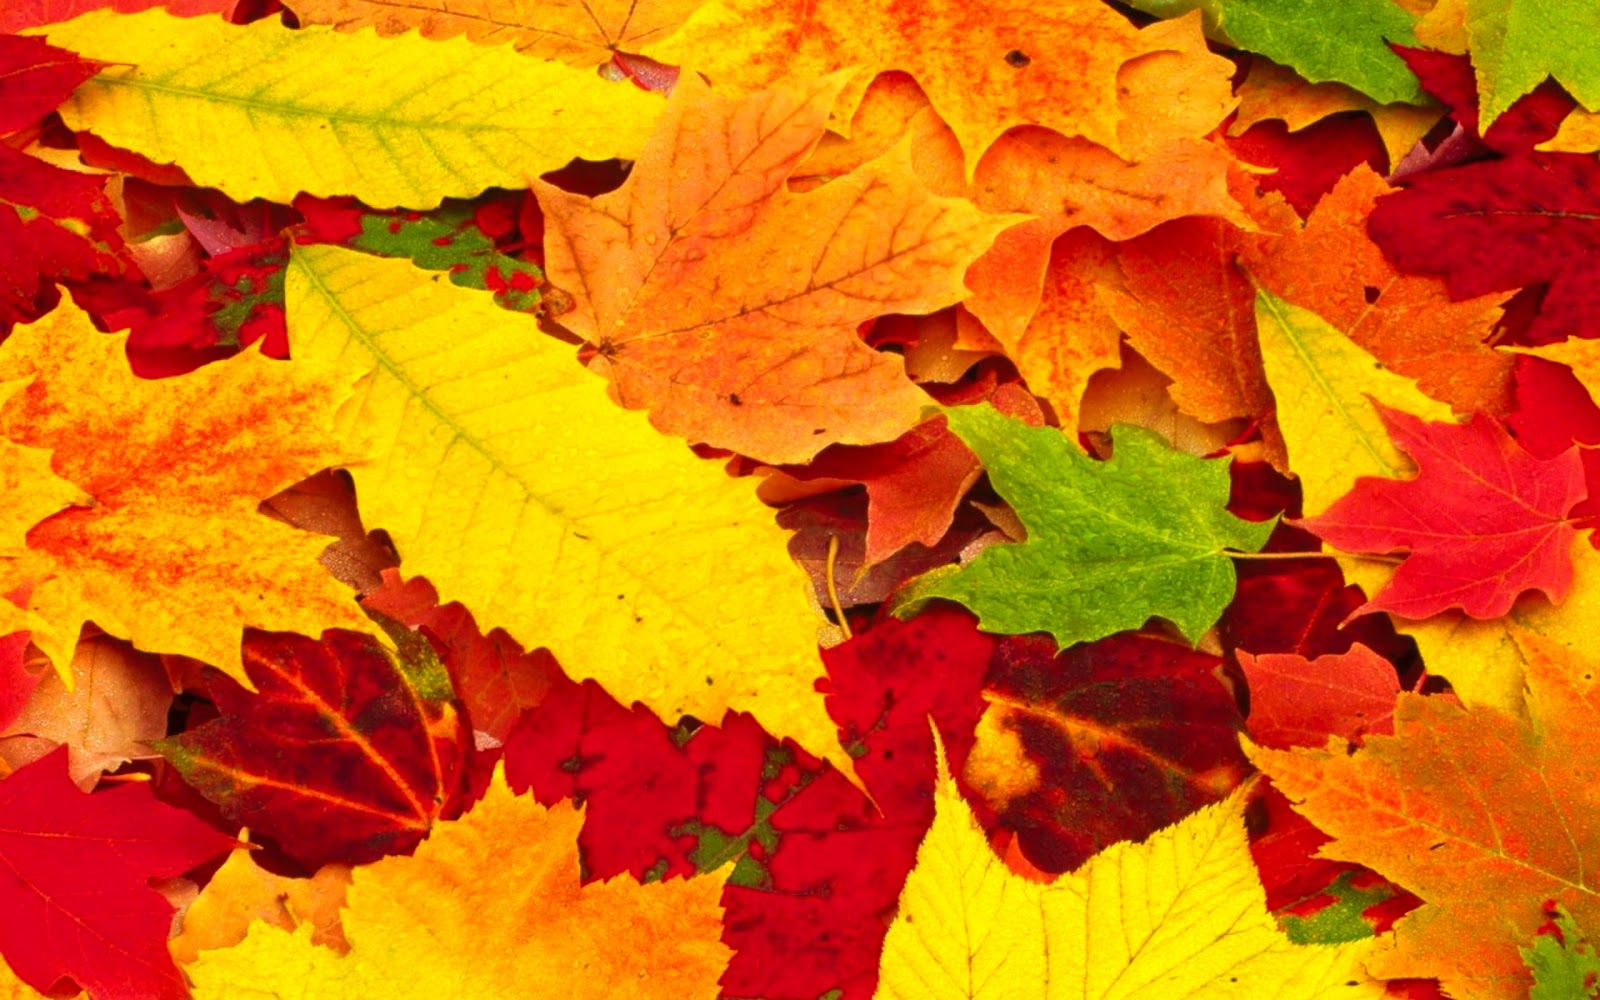 Fall Leaves Photography Wallpaper Desktop Wallpapers,Ani...